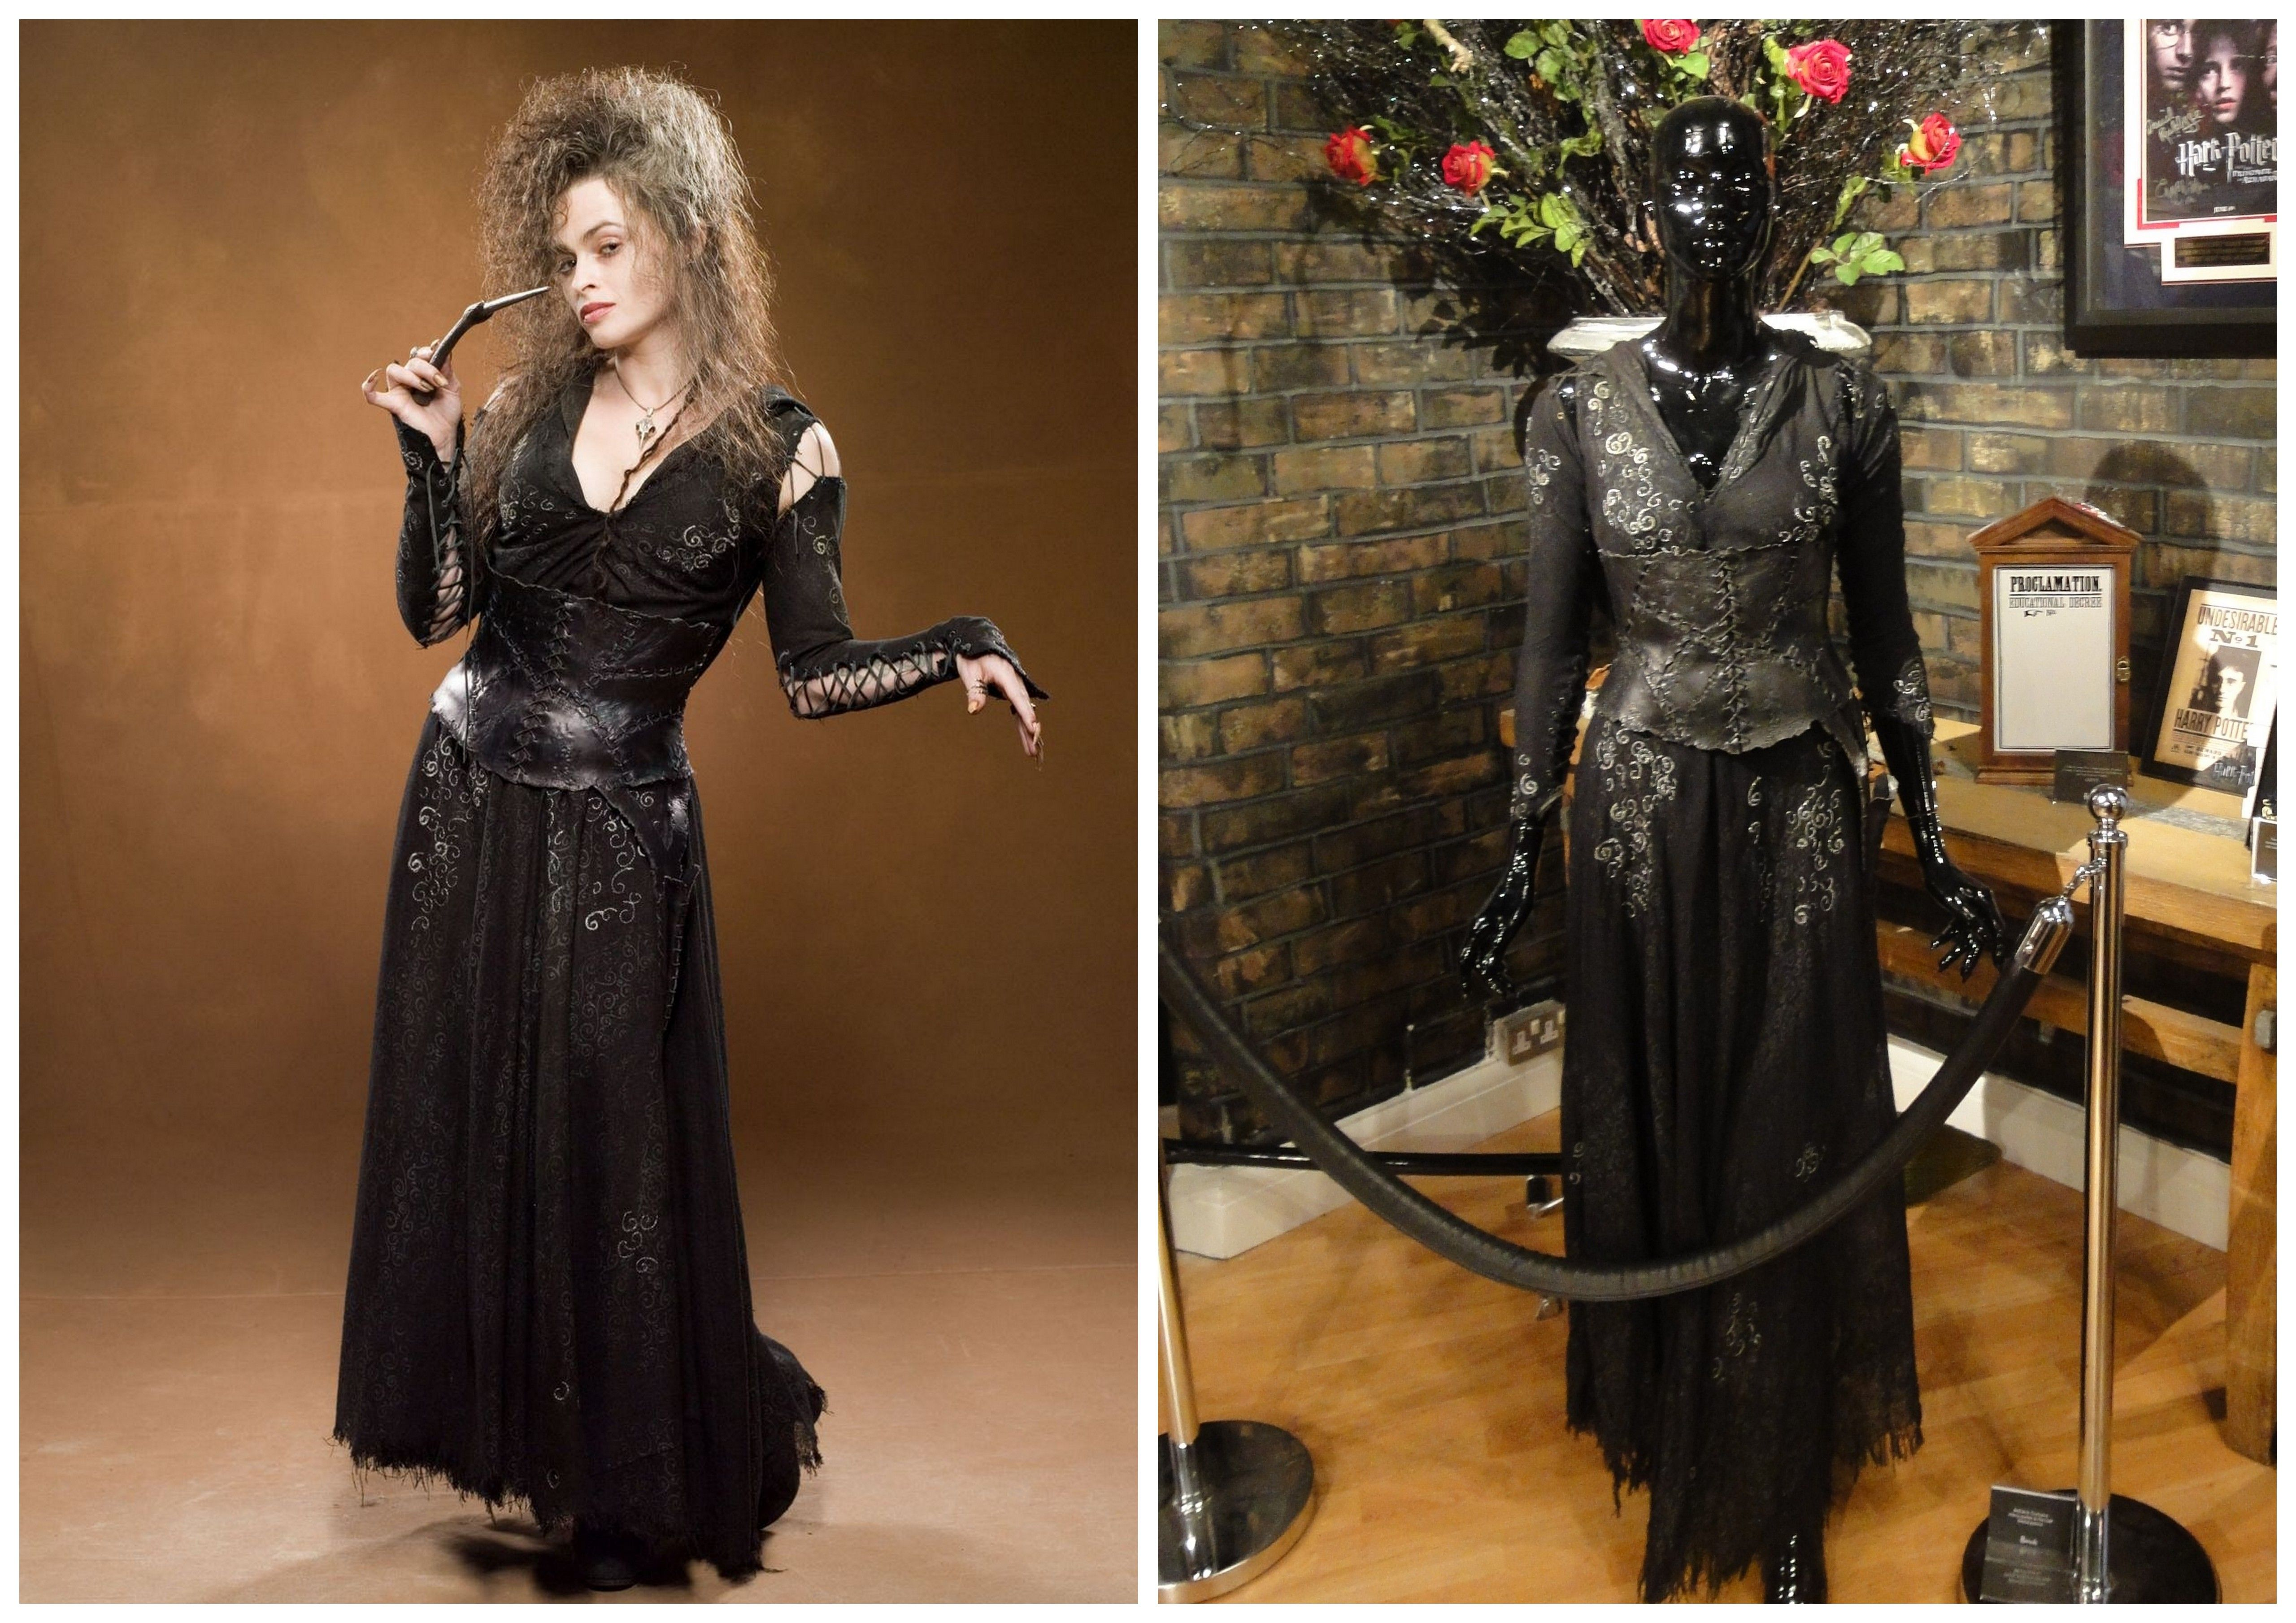 Helena Bonham Carter Harry Potter Costume Google Search Harry Potter Costume Bellatrix Lestrange Cosplay Harry Potter Bellatrix Lestrange